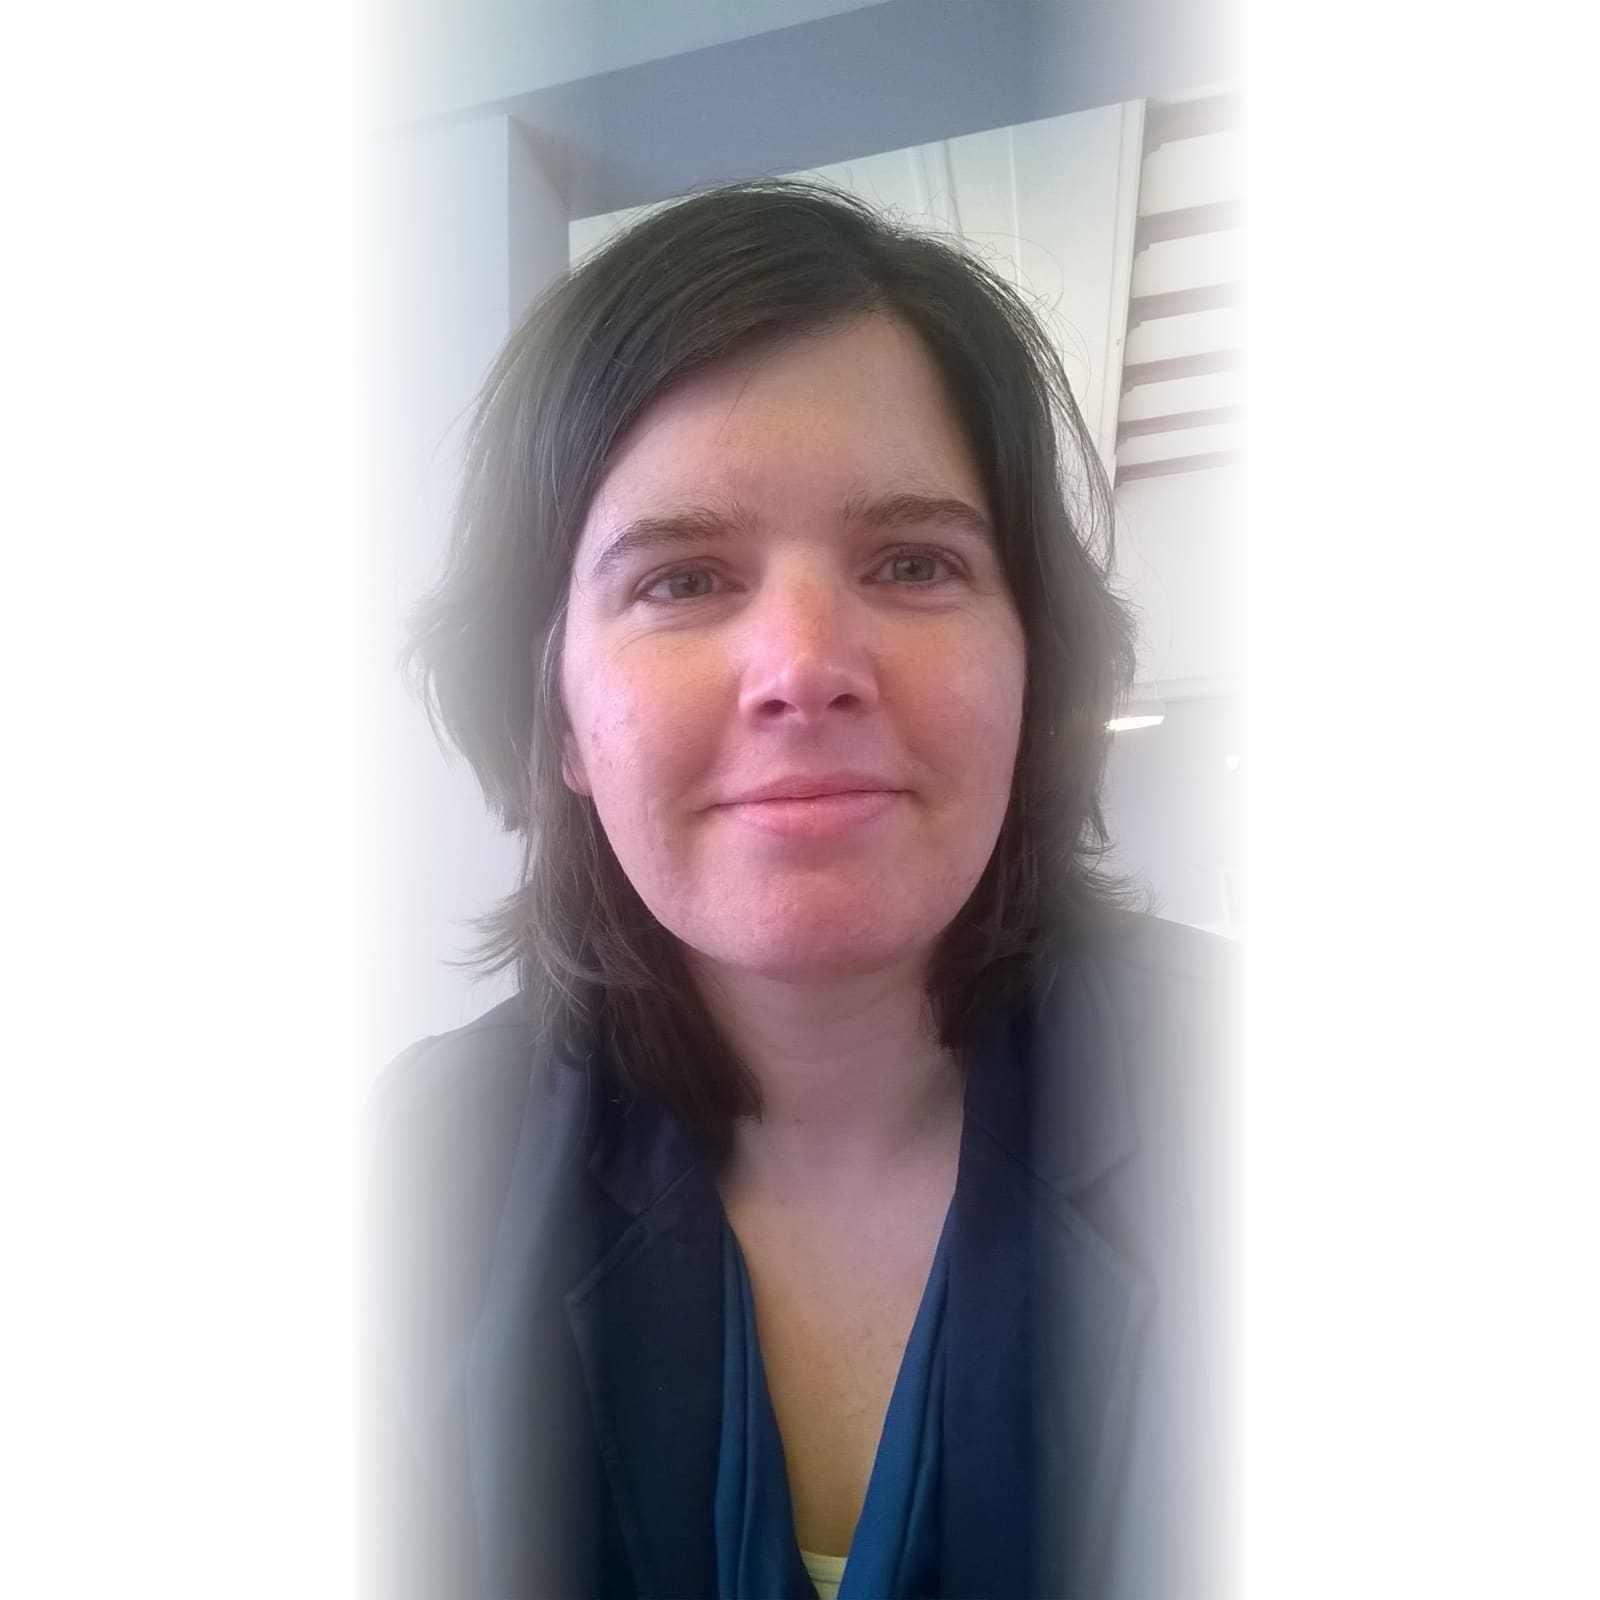 Miriam Claessen-Abraas - Administratief medewerkster in Voerendaal